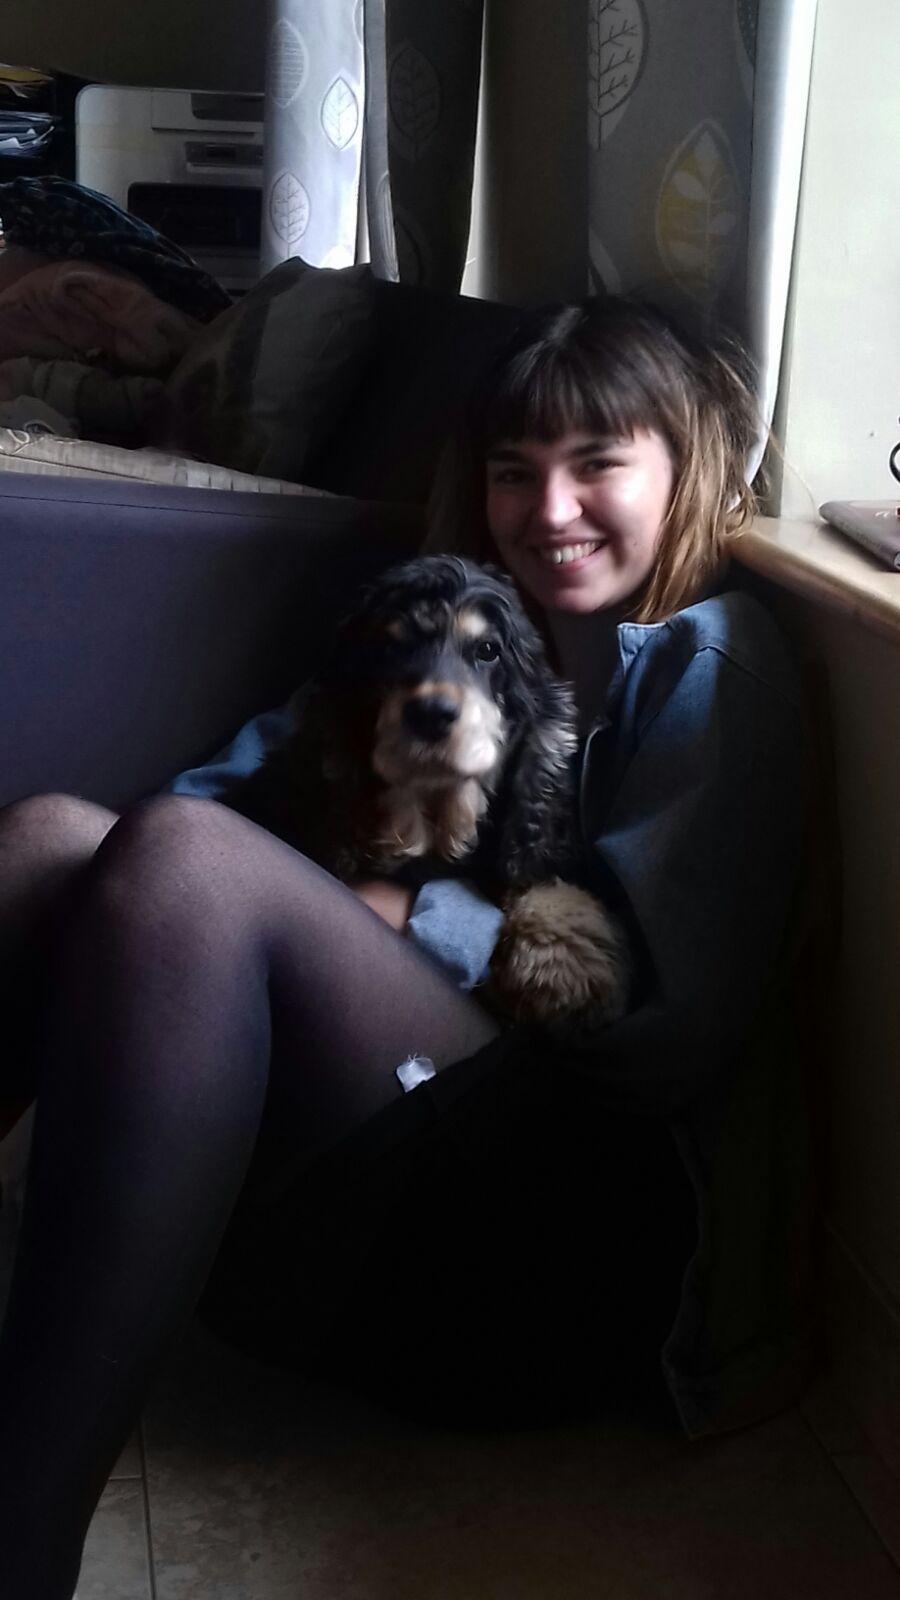 Dr. Lorea Nevin of Shaughnessy Veterinary Hospital